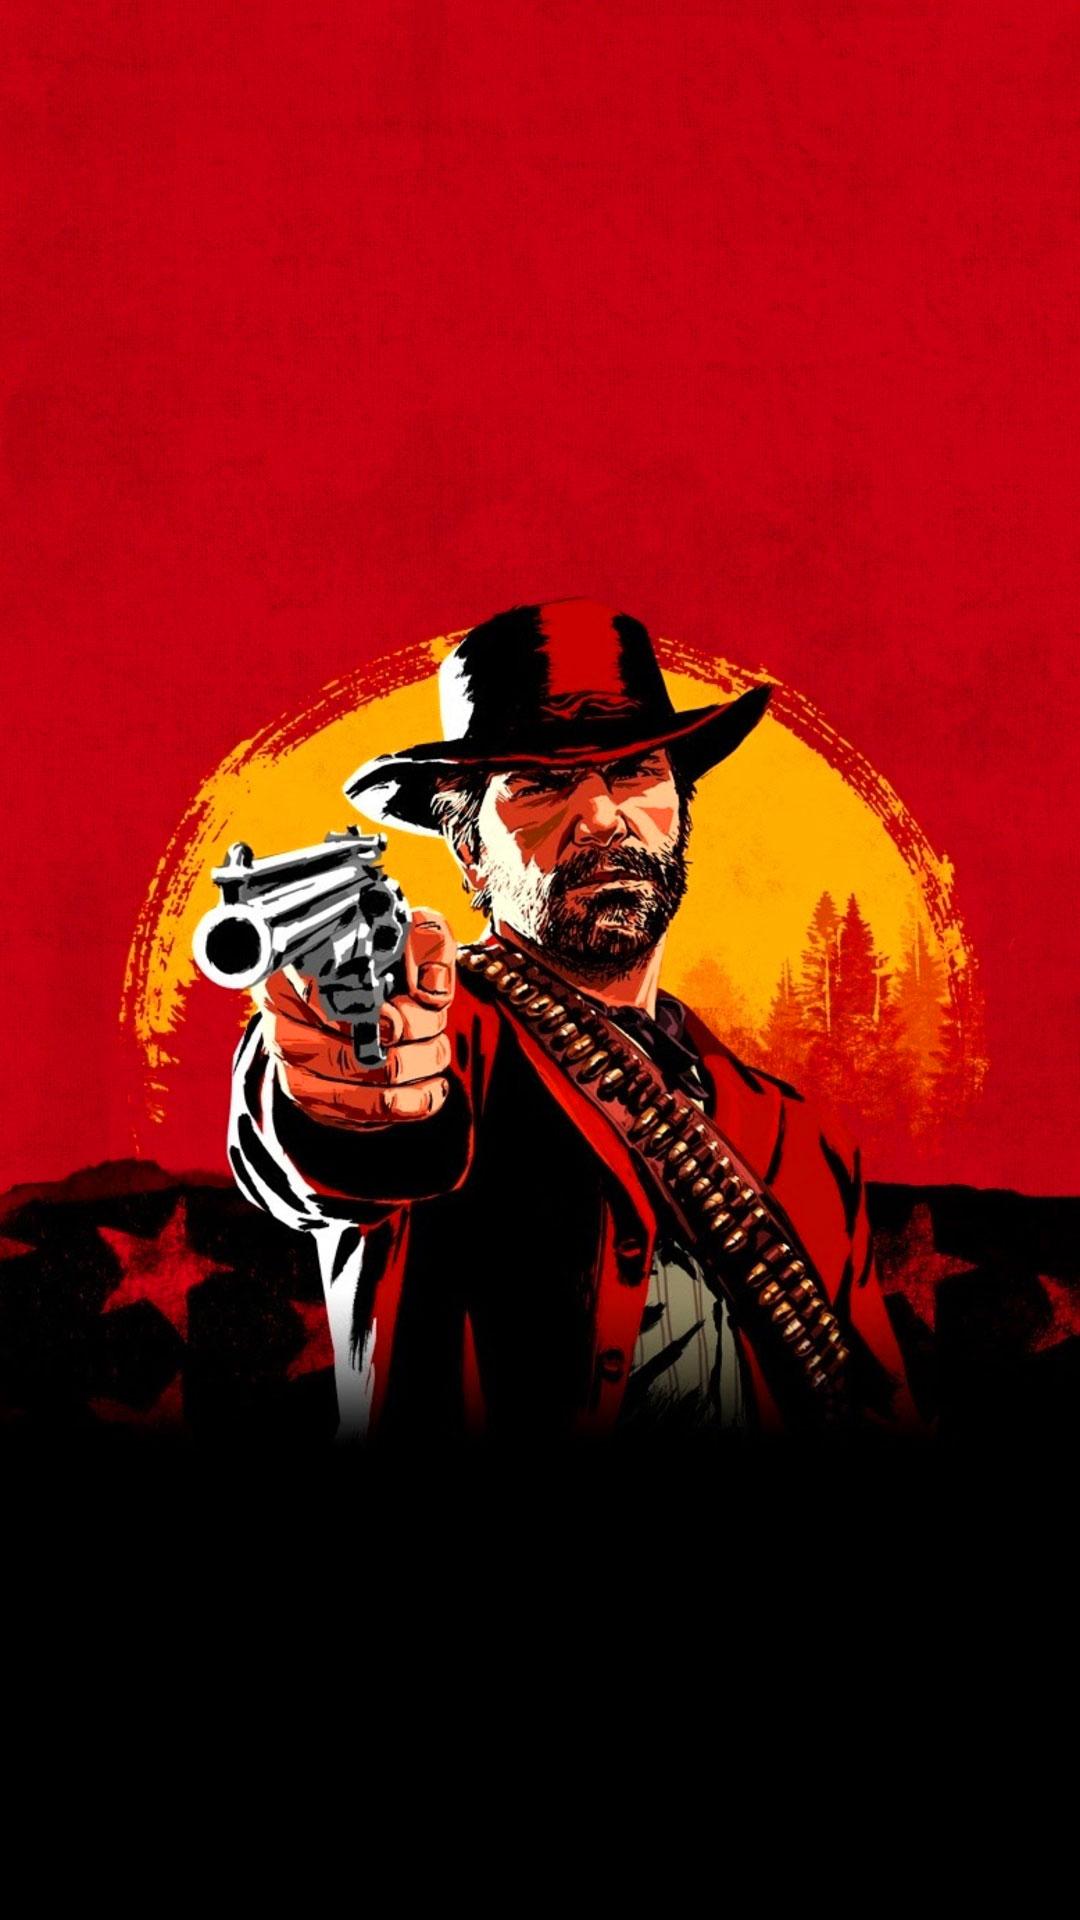 hd Best Red Wallpaper